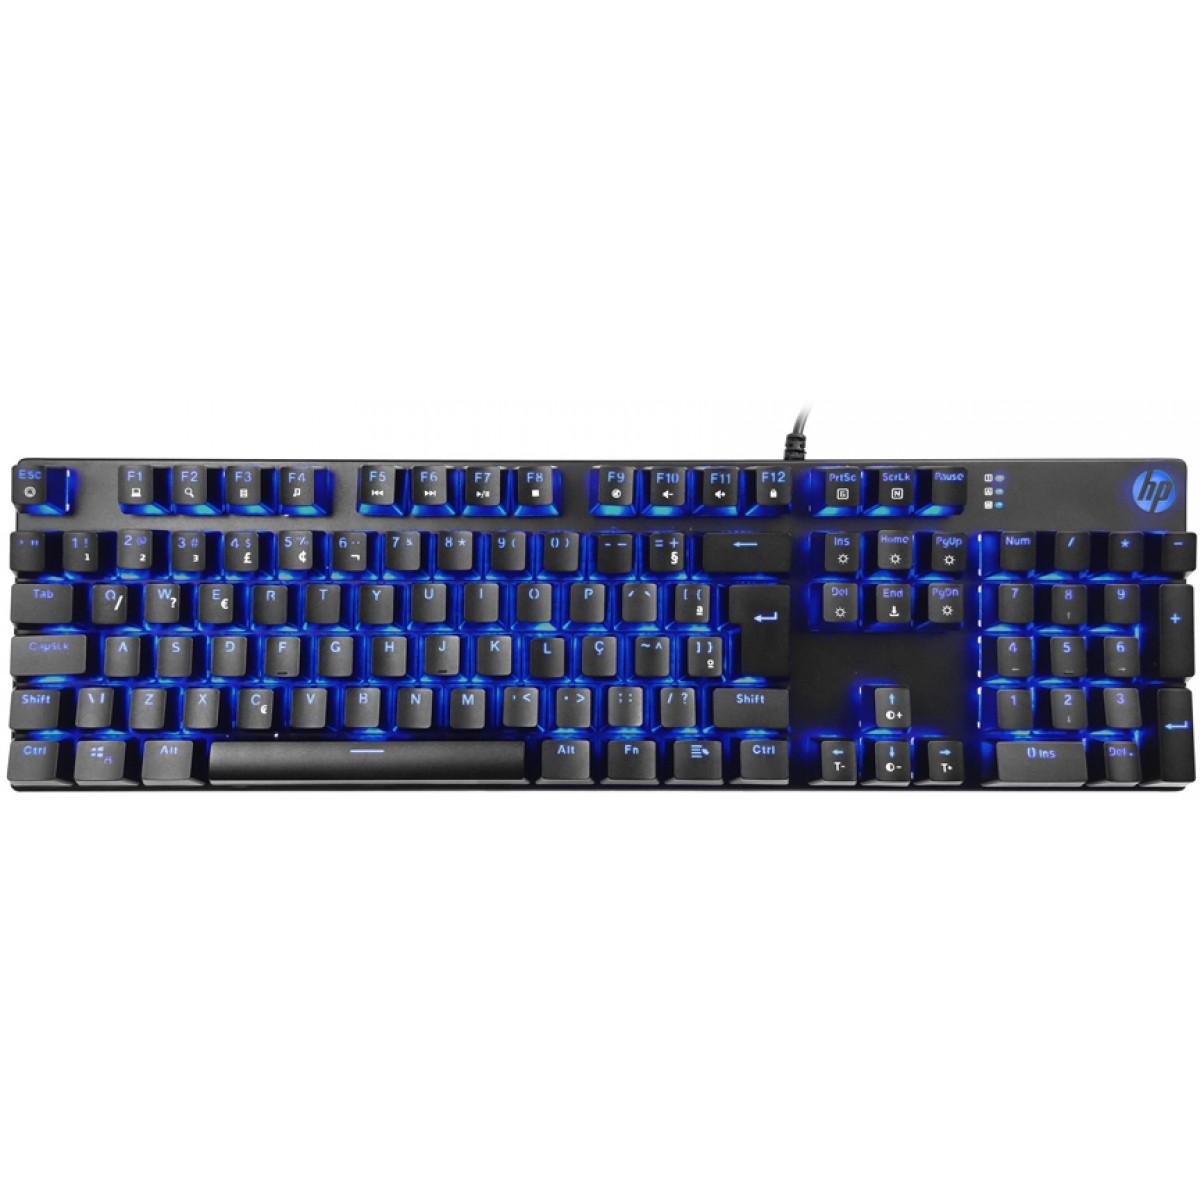 Teclado Mecânico Gamer HP GK400F, Switch Blue, Led Blue, Black